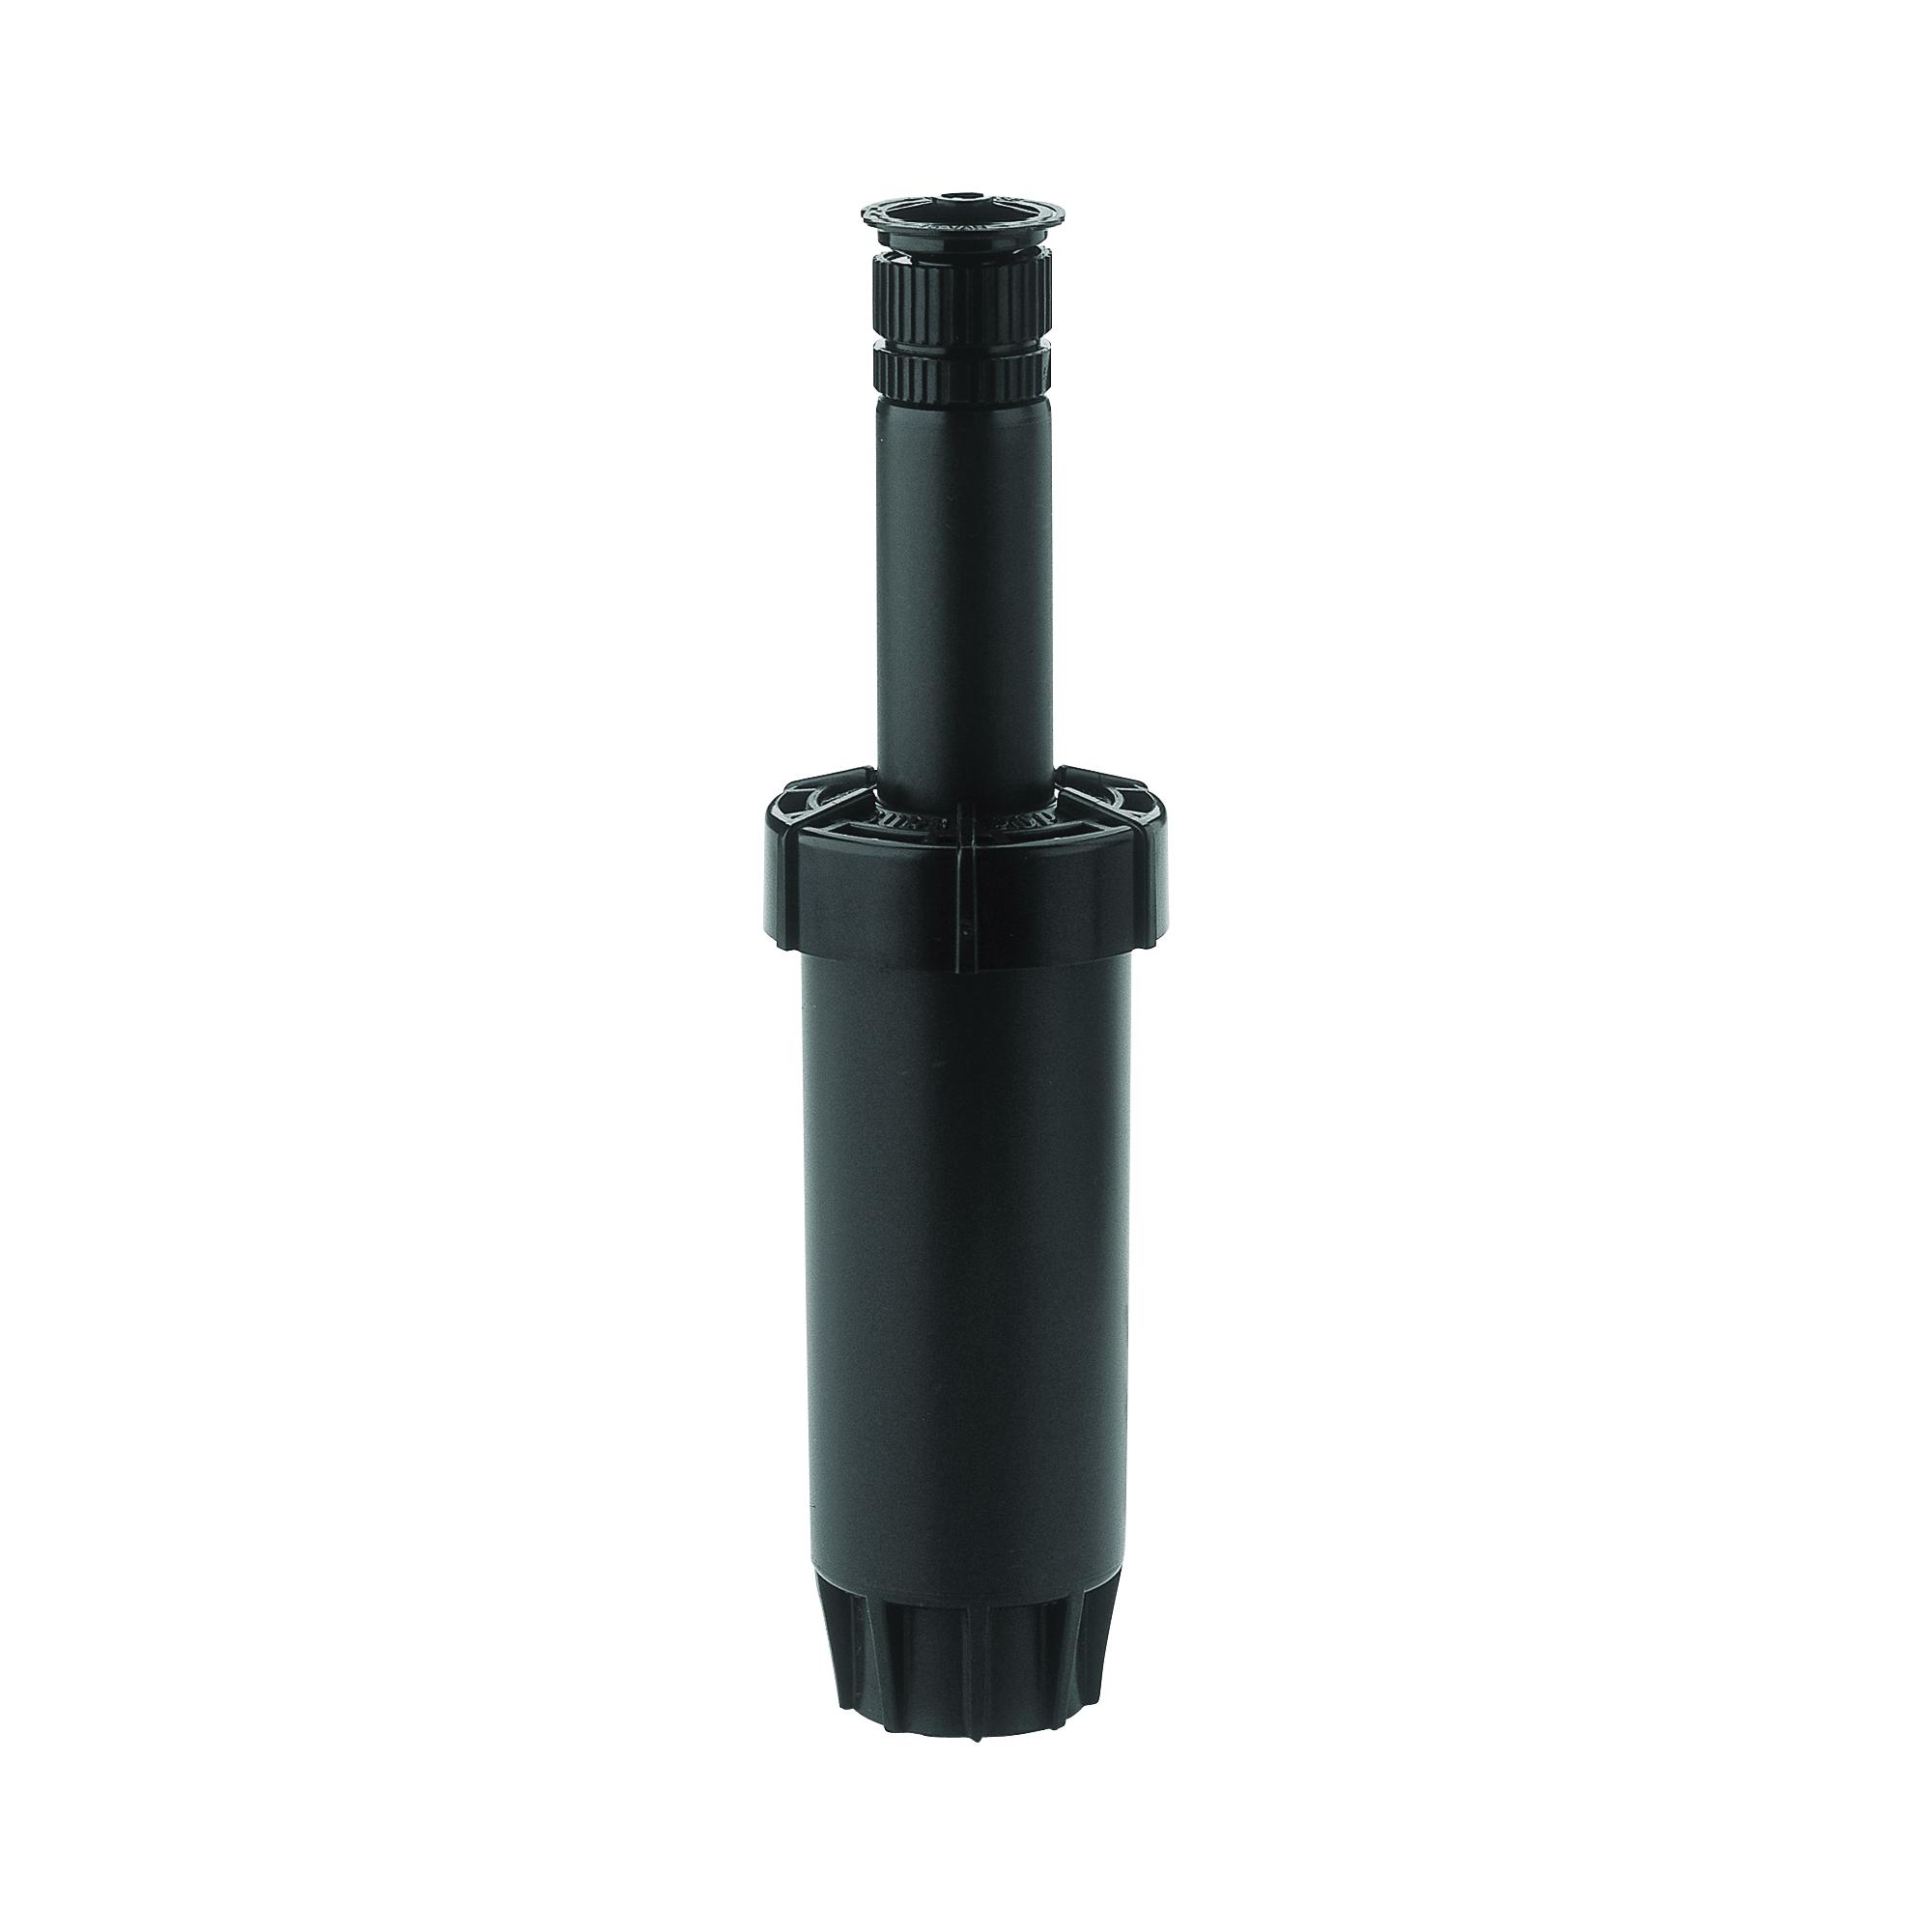 Picture of Rain Bird SP25F18/SP25FS18 Spray Head Sprinkler, 1/2 in Connection, FNPT, Plastic